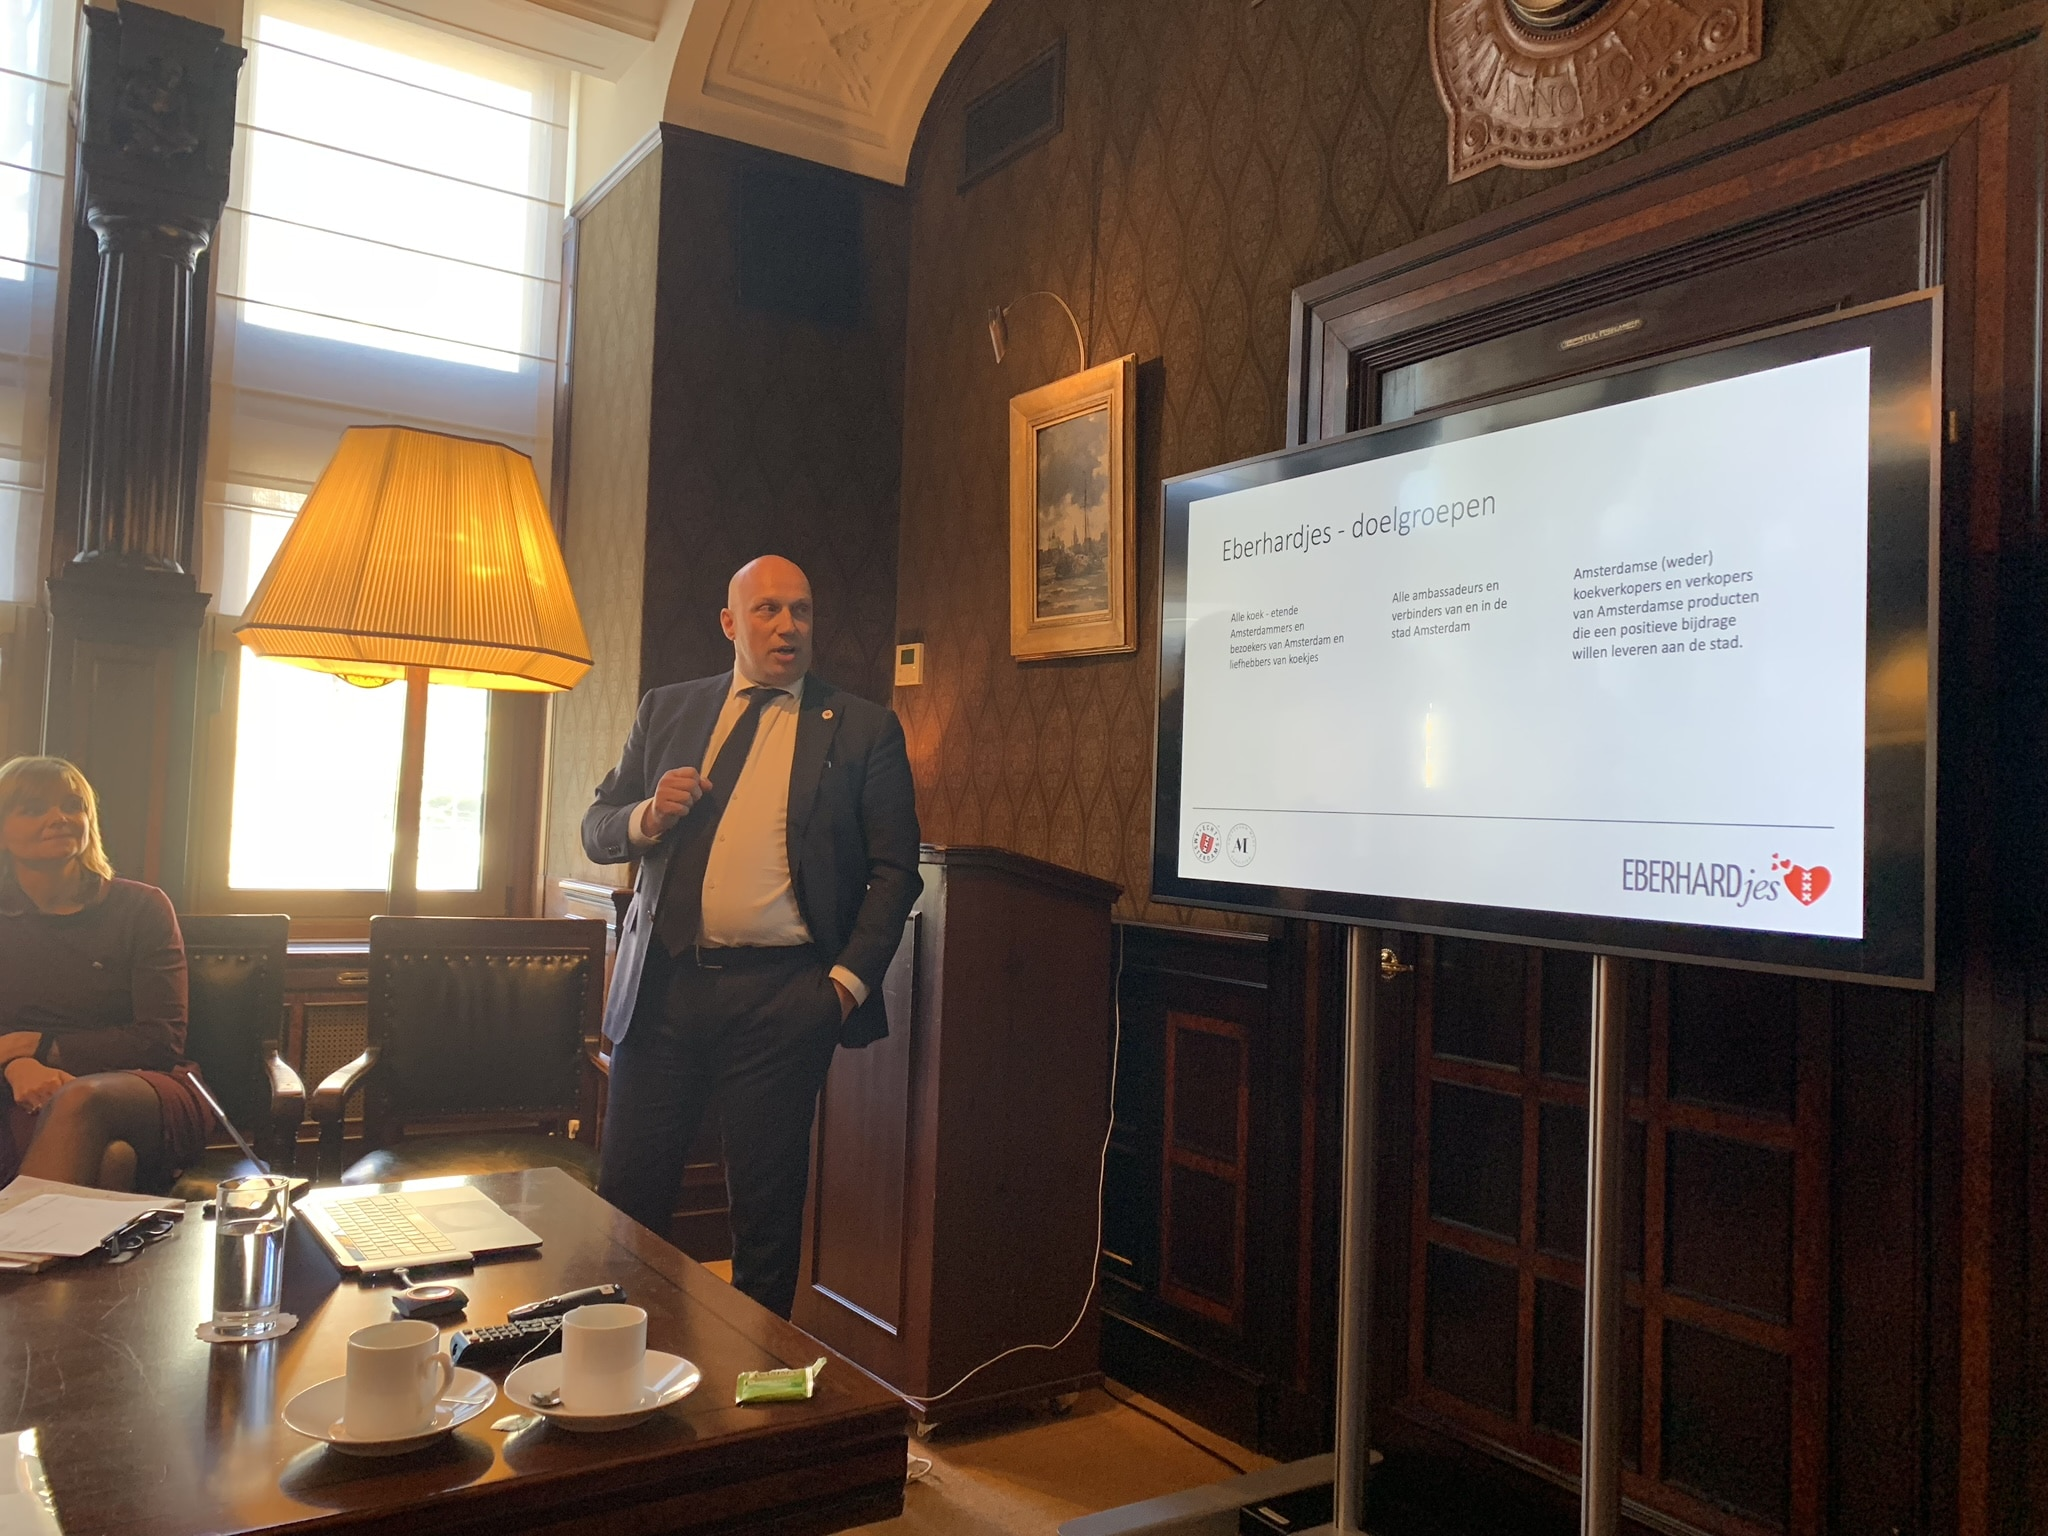 Brainstorm Eberhardjes in de Koninklijke Industrieele Groote Club